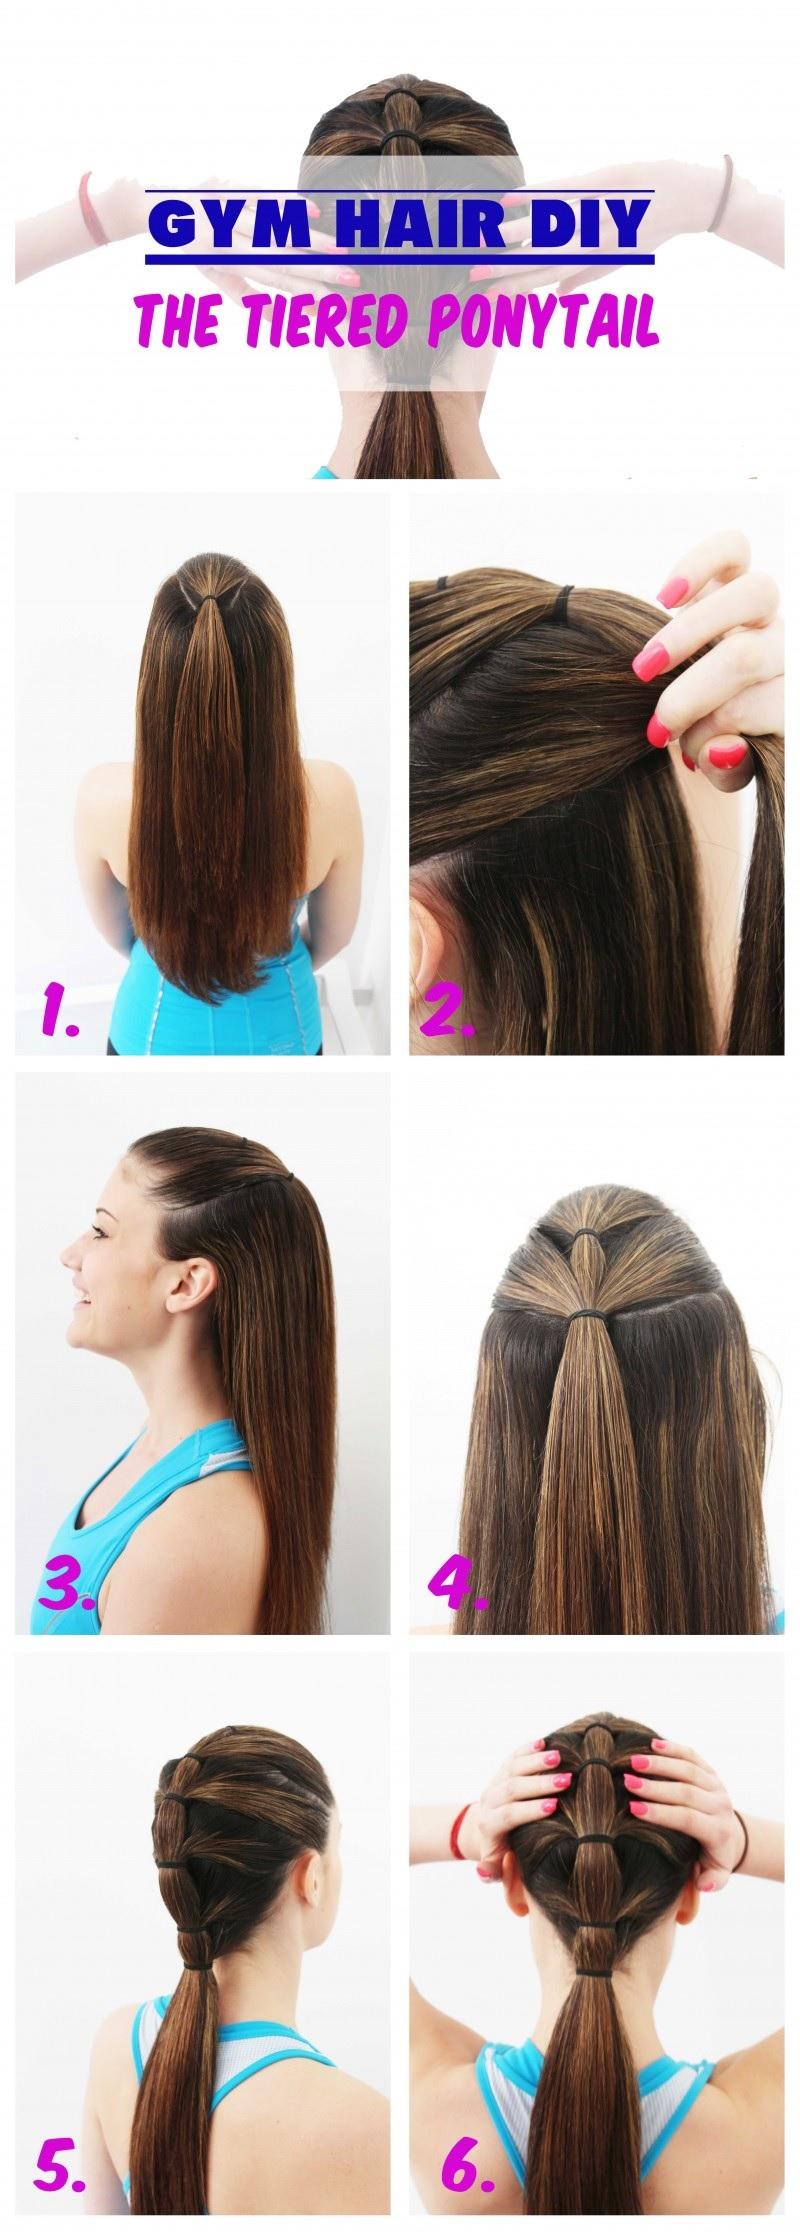 Astuce coiffure femme